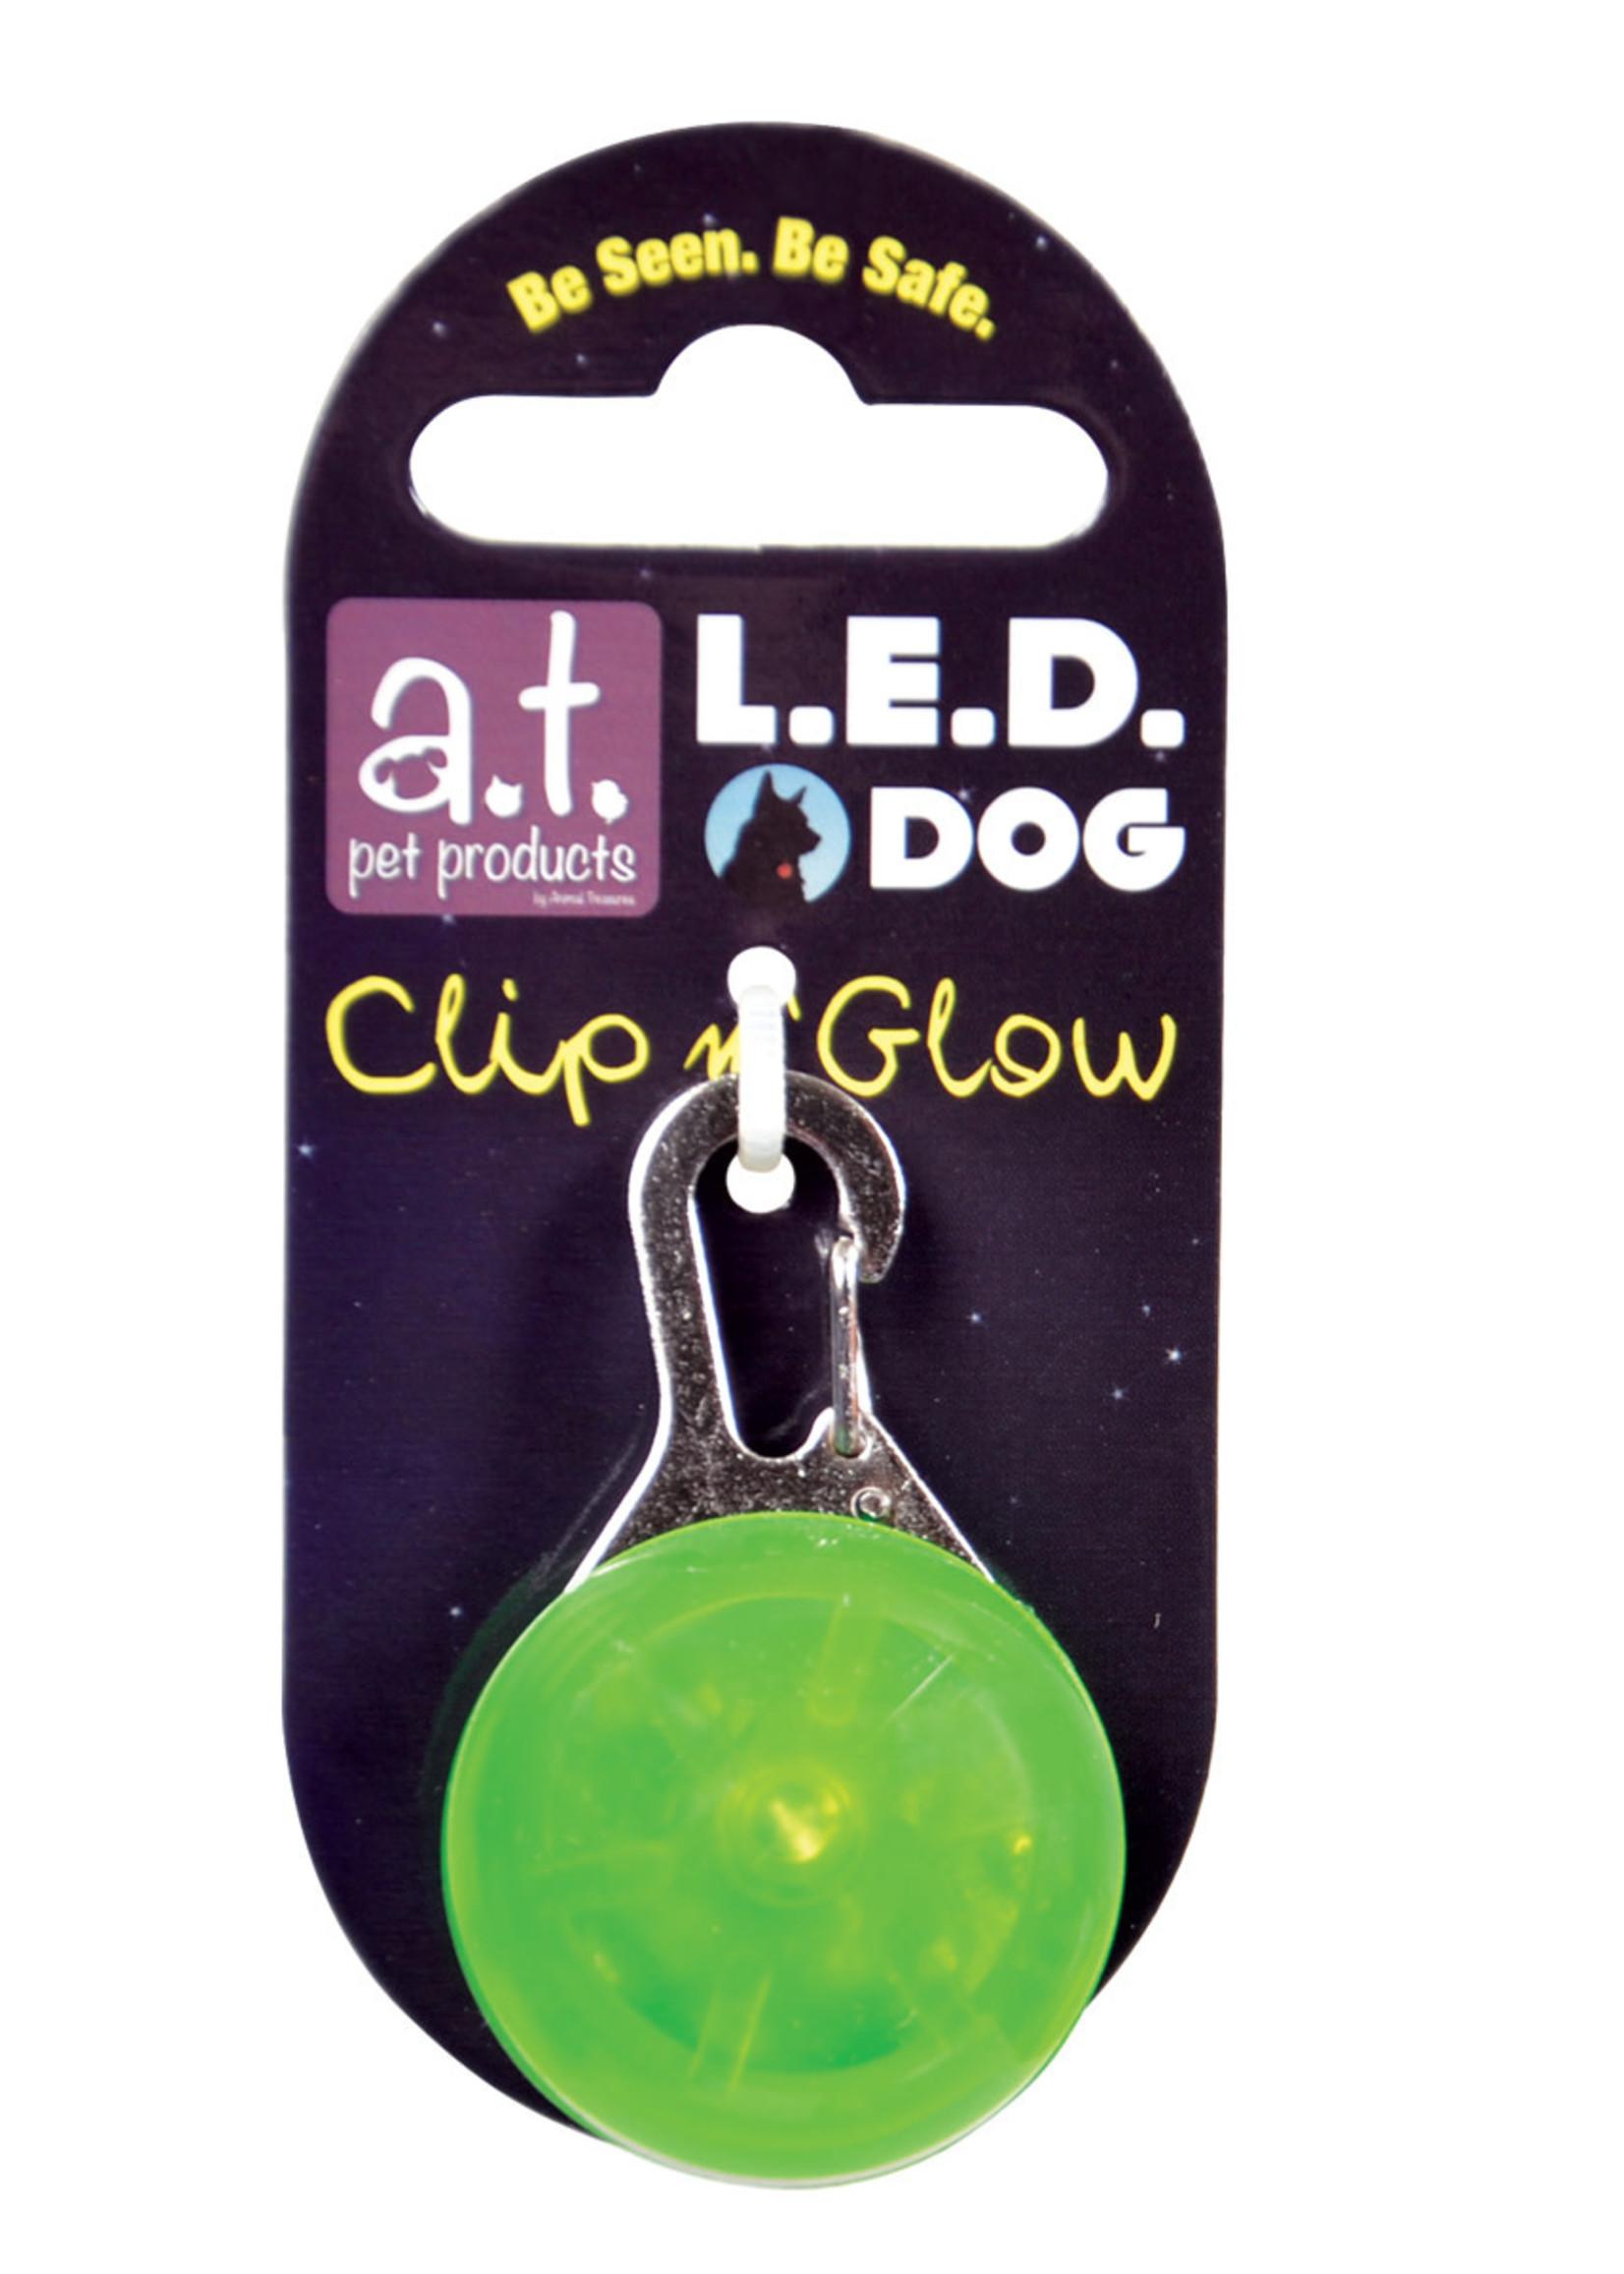 Animal Treasures Animal Treasures LED Clip n' Glow Tag - Green